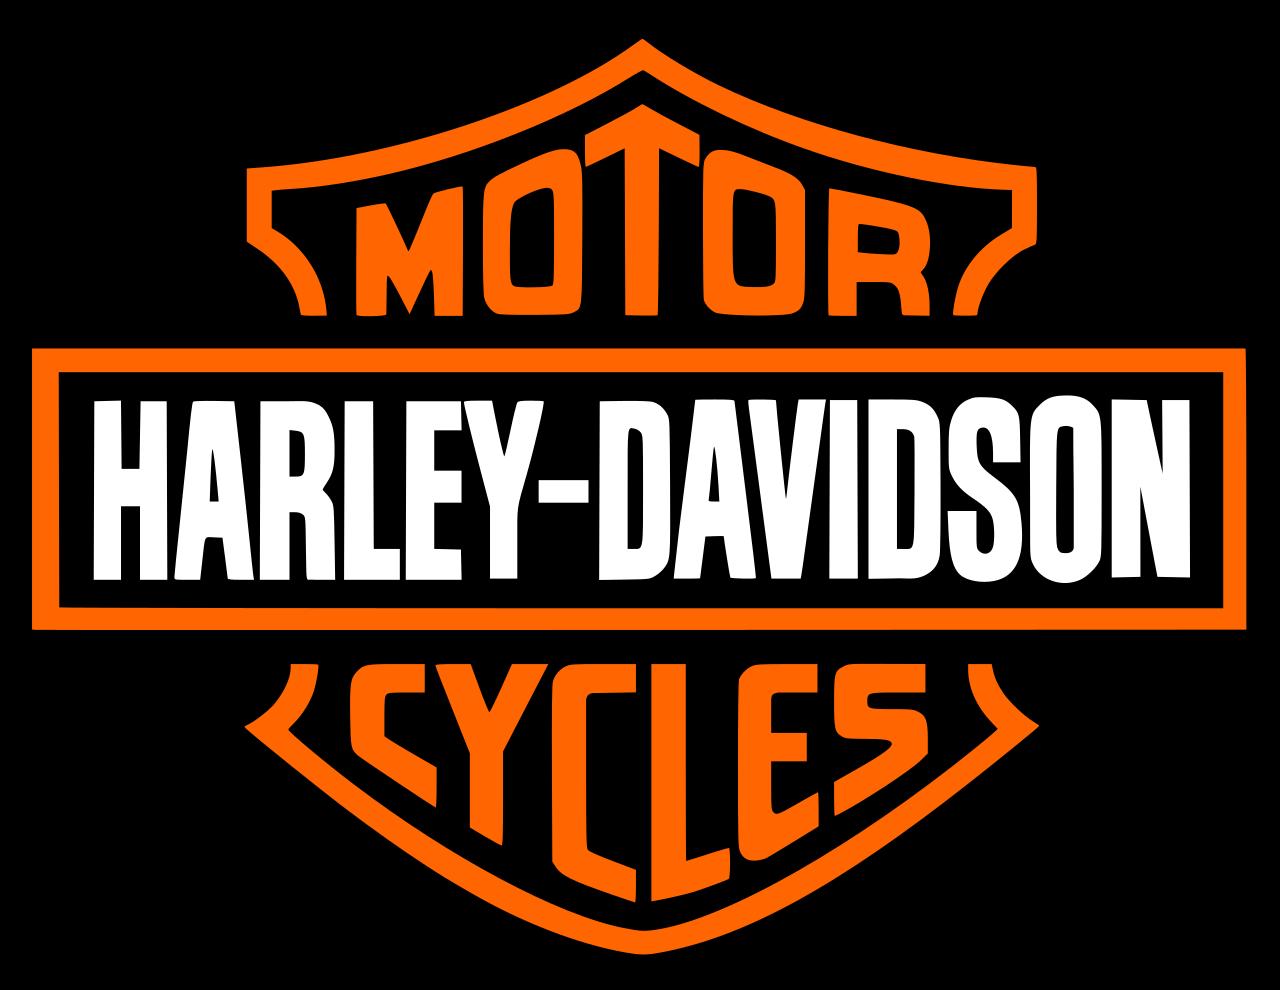 Harley Davidson Logo Png Image Harley Davidson Logo Harley Davidson Wallpaper Harley Davidson Cake